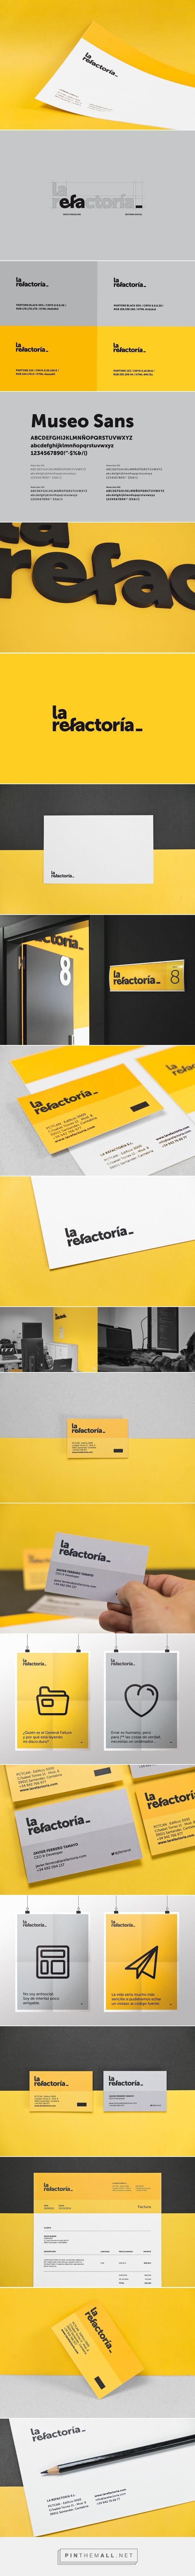 La Refactoría on Behance - created via https://pinthemall.net